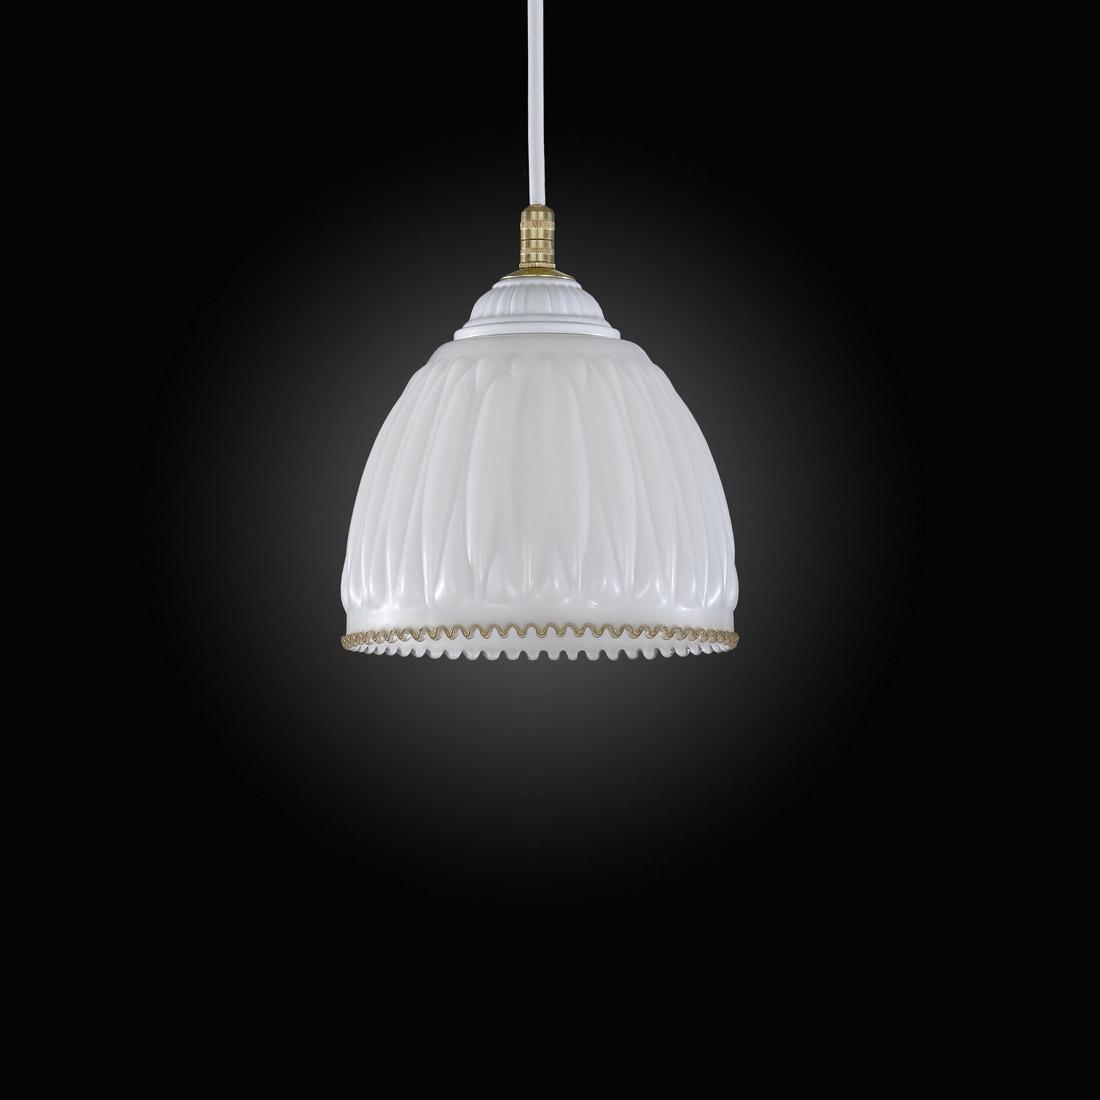 Подвесной светильник Reccagni Angelo L 9601/14 люстра reccagni angelo 9601 pl 9601 3